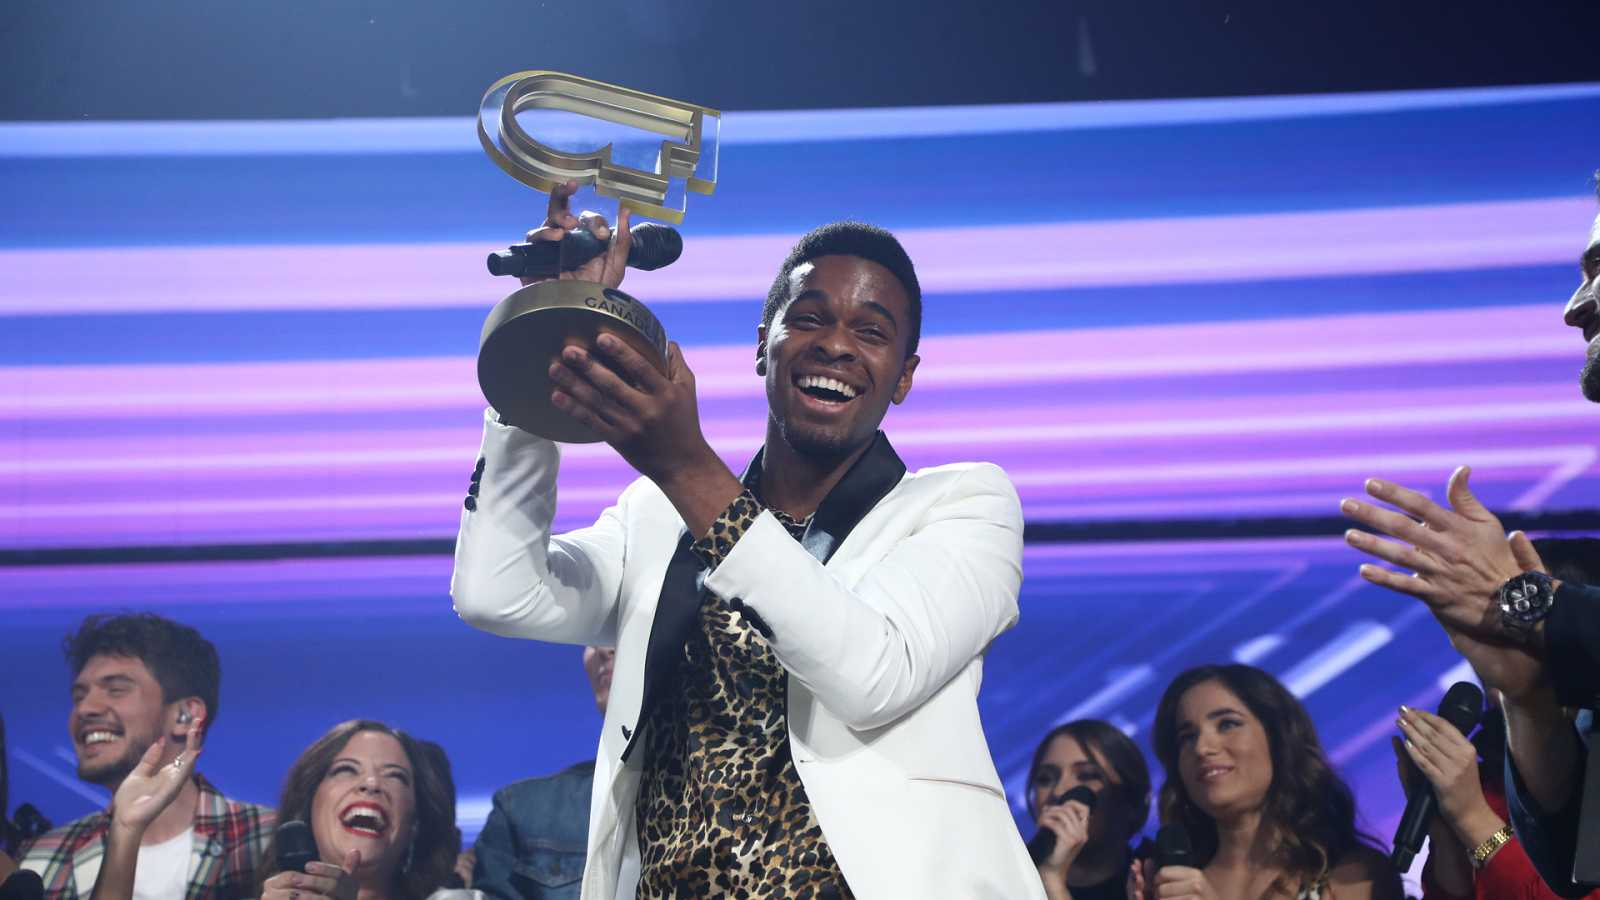 OT 2018 - Famous gana Operación Triunfo 2018 en la gala final